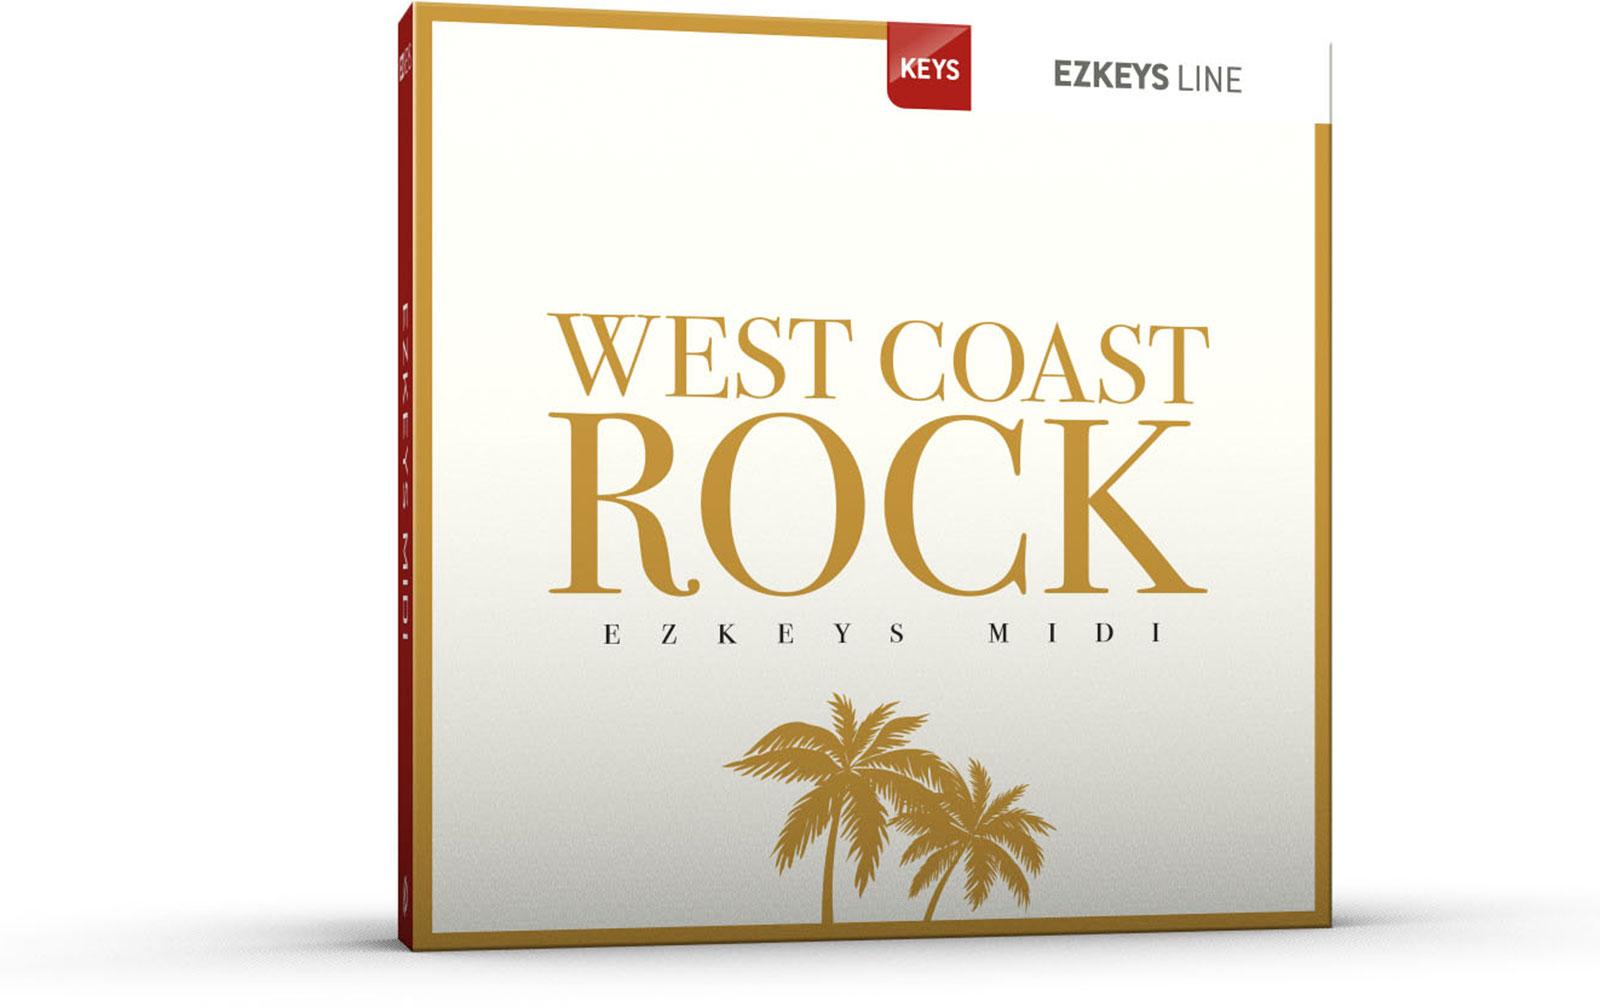 toontrack-ezkeys-west-coast-rock-midi-pack-download-